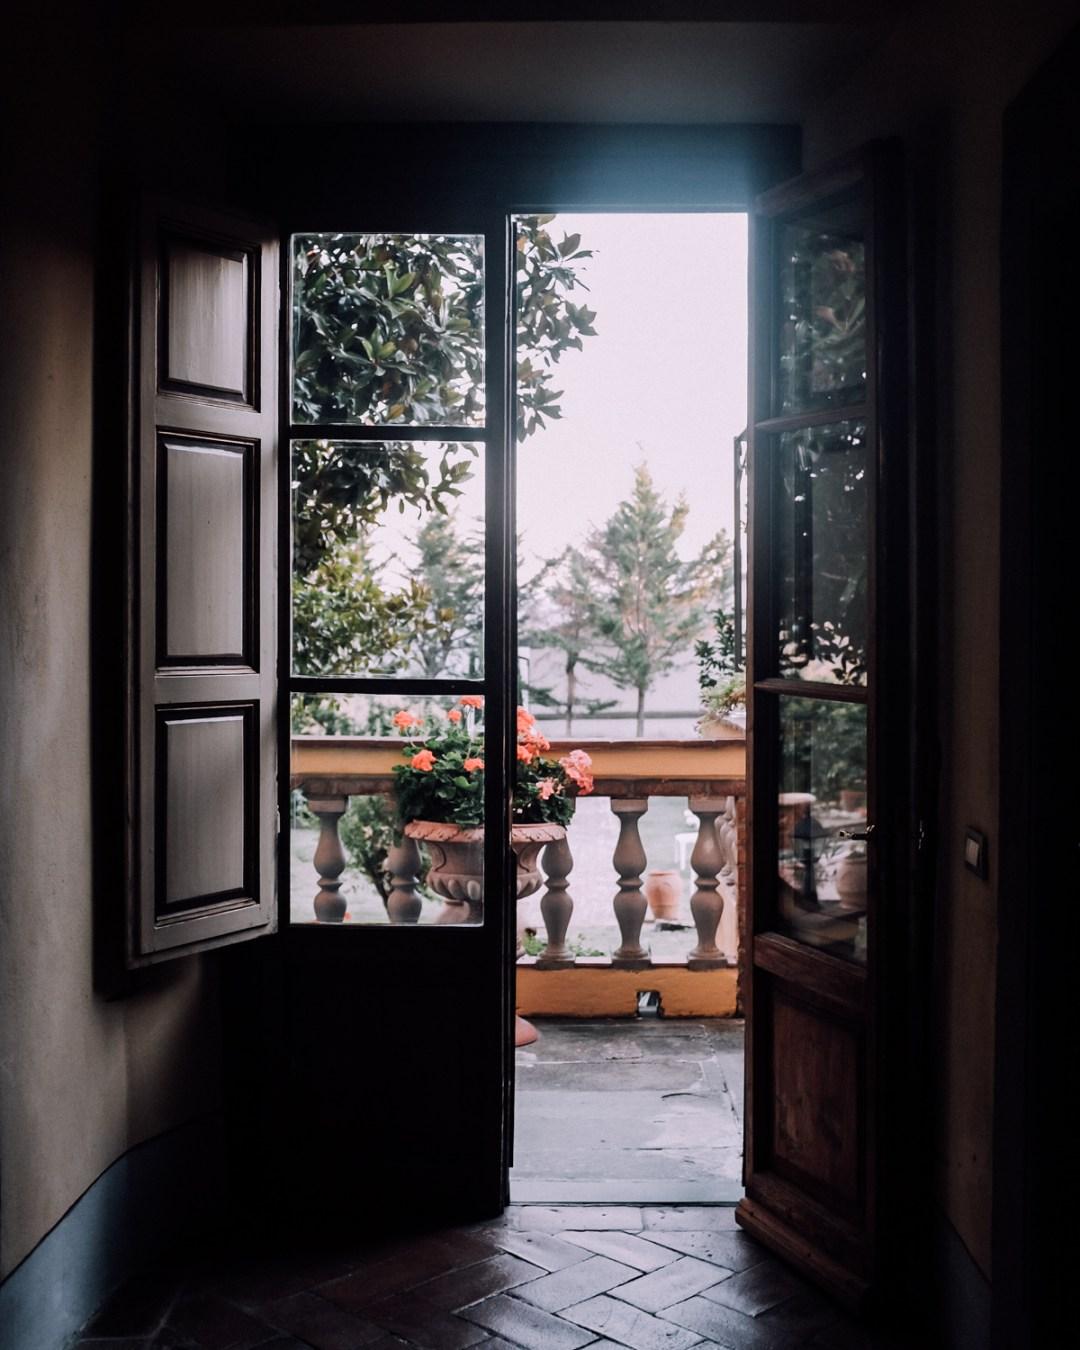 inastil, Ü50Blogger, Reiseblogger, Toskana, Villa, Florenz, Siena, Certaldo, Lifestyle, Italienreise, Italienliebe, Cabriotour-6